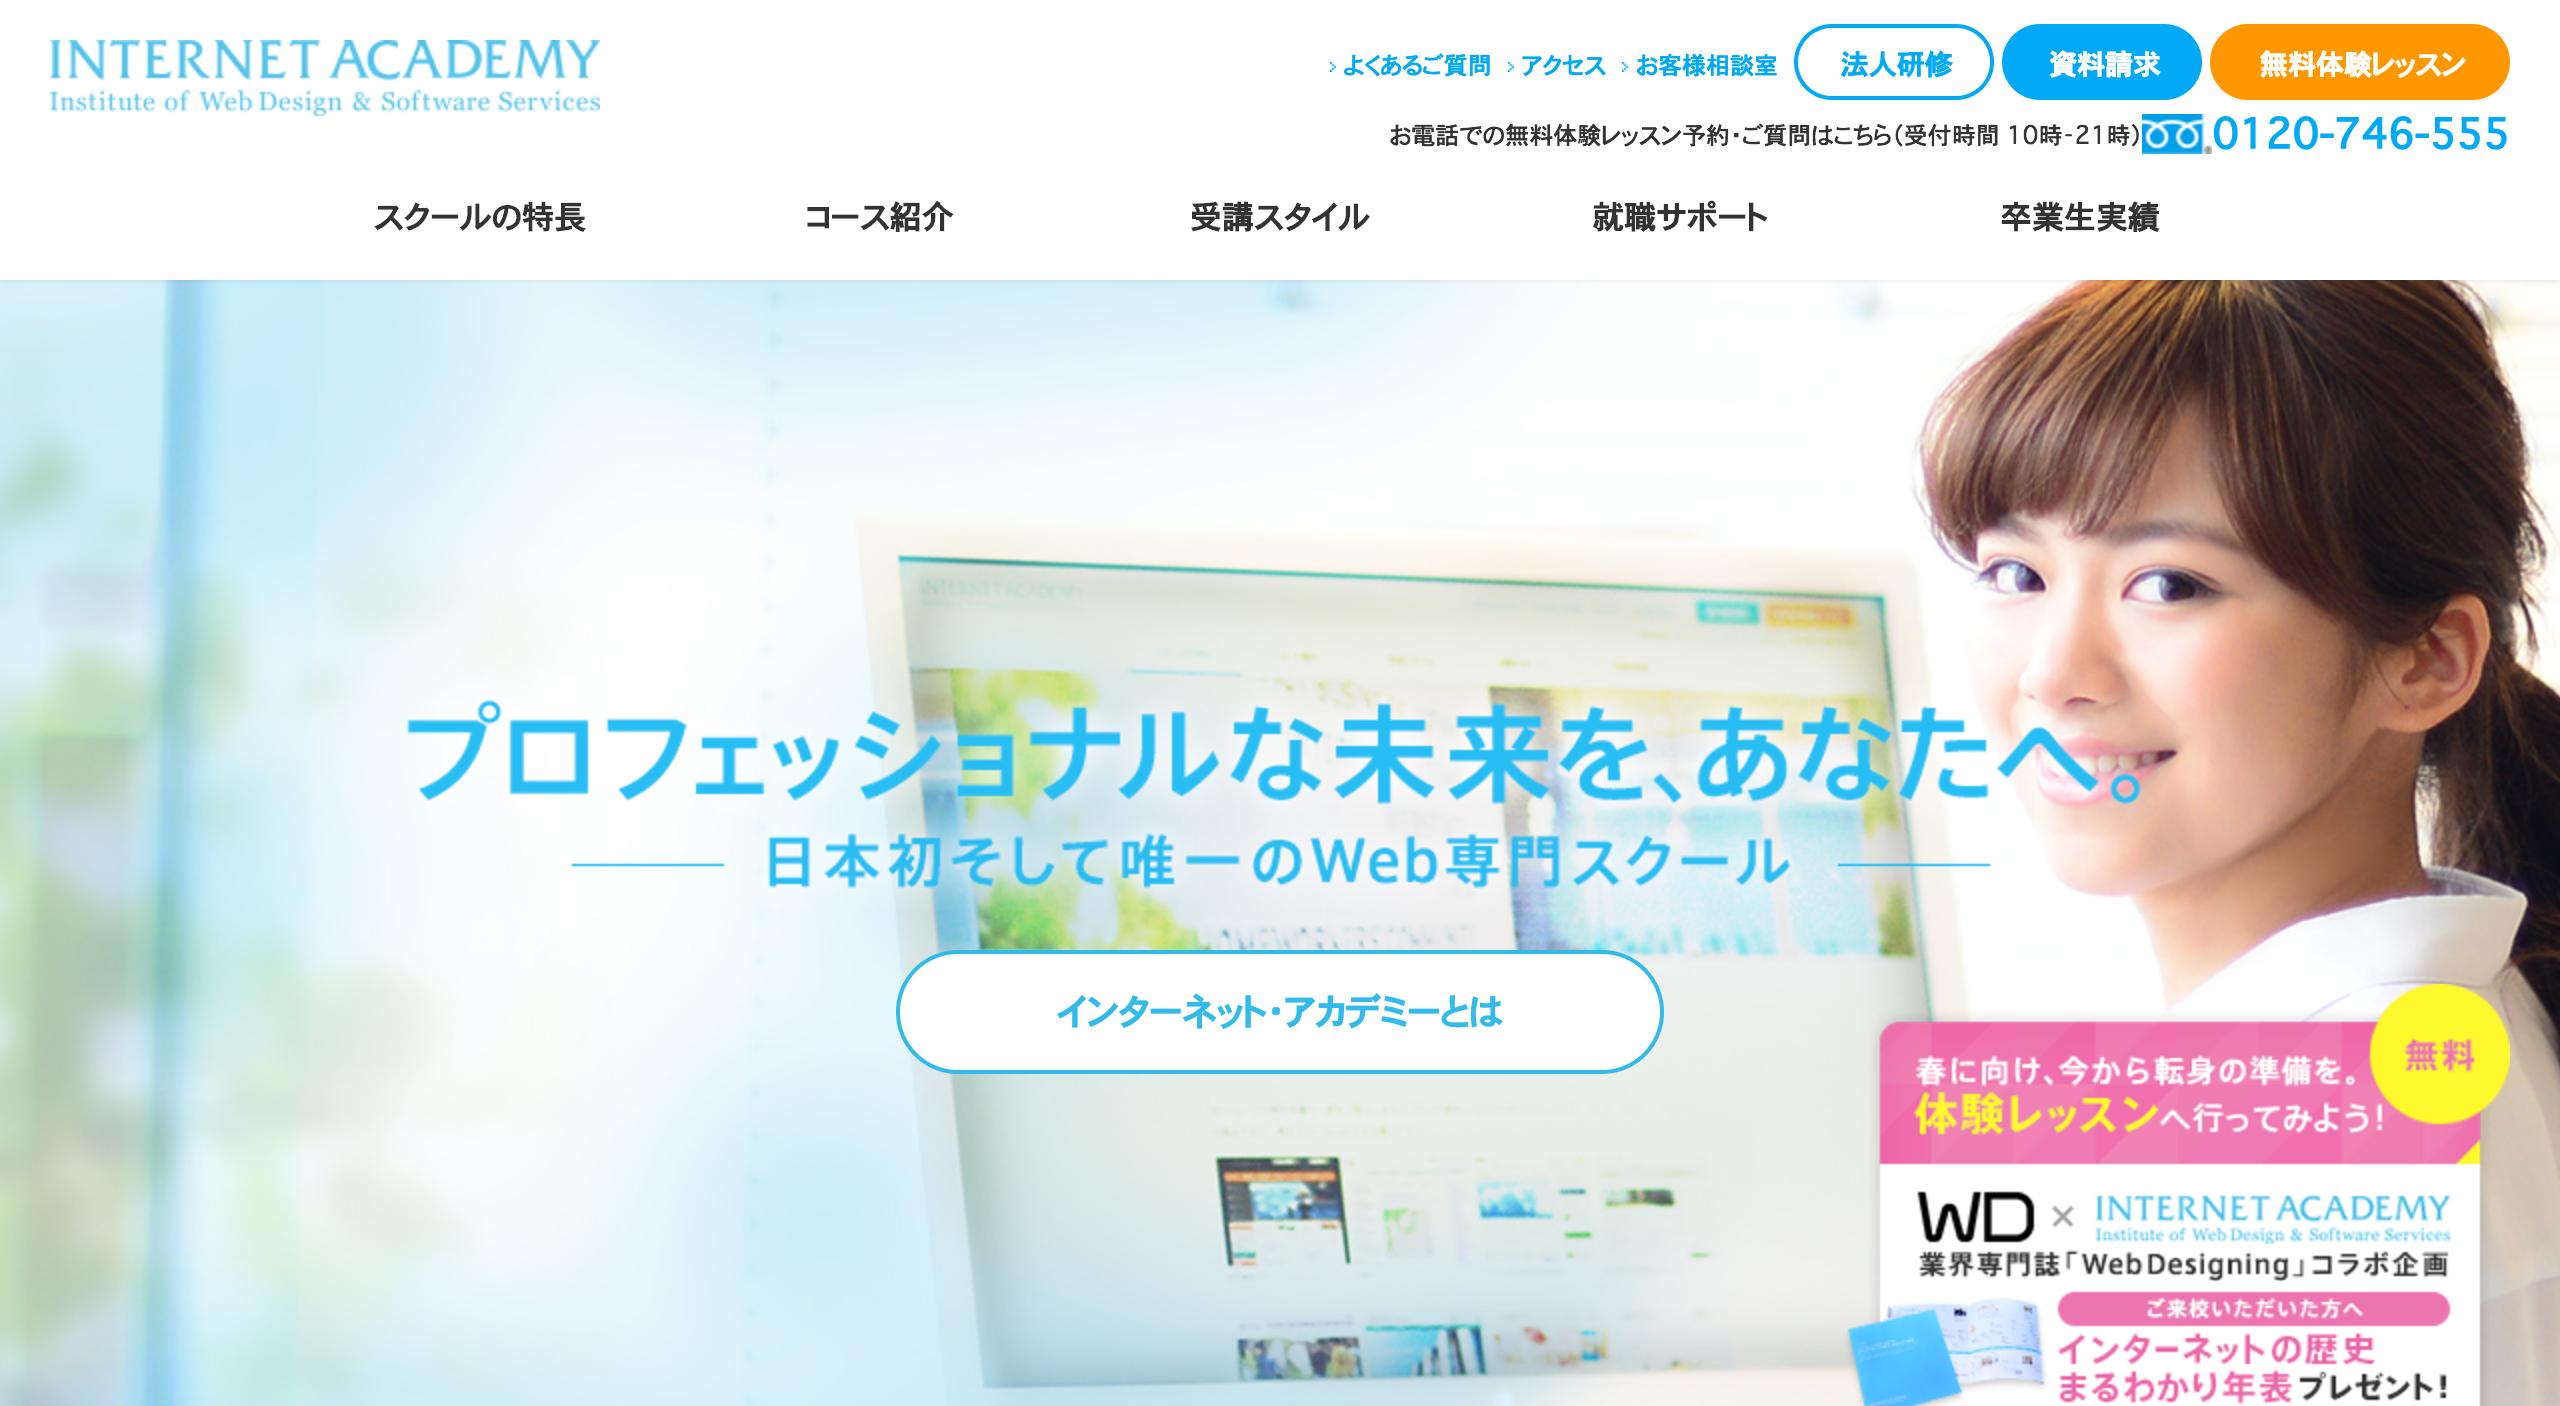 FireShot Capture 192 - Webデザイン・Webデザイナースクール【インターネット・アカデミー】 - https___www.internetacademy.jp_